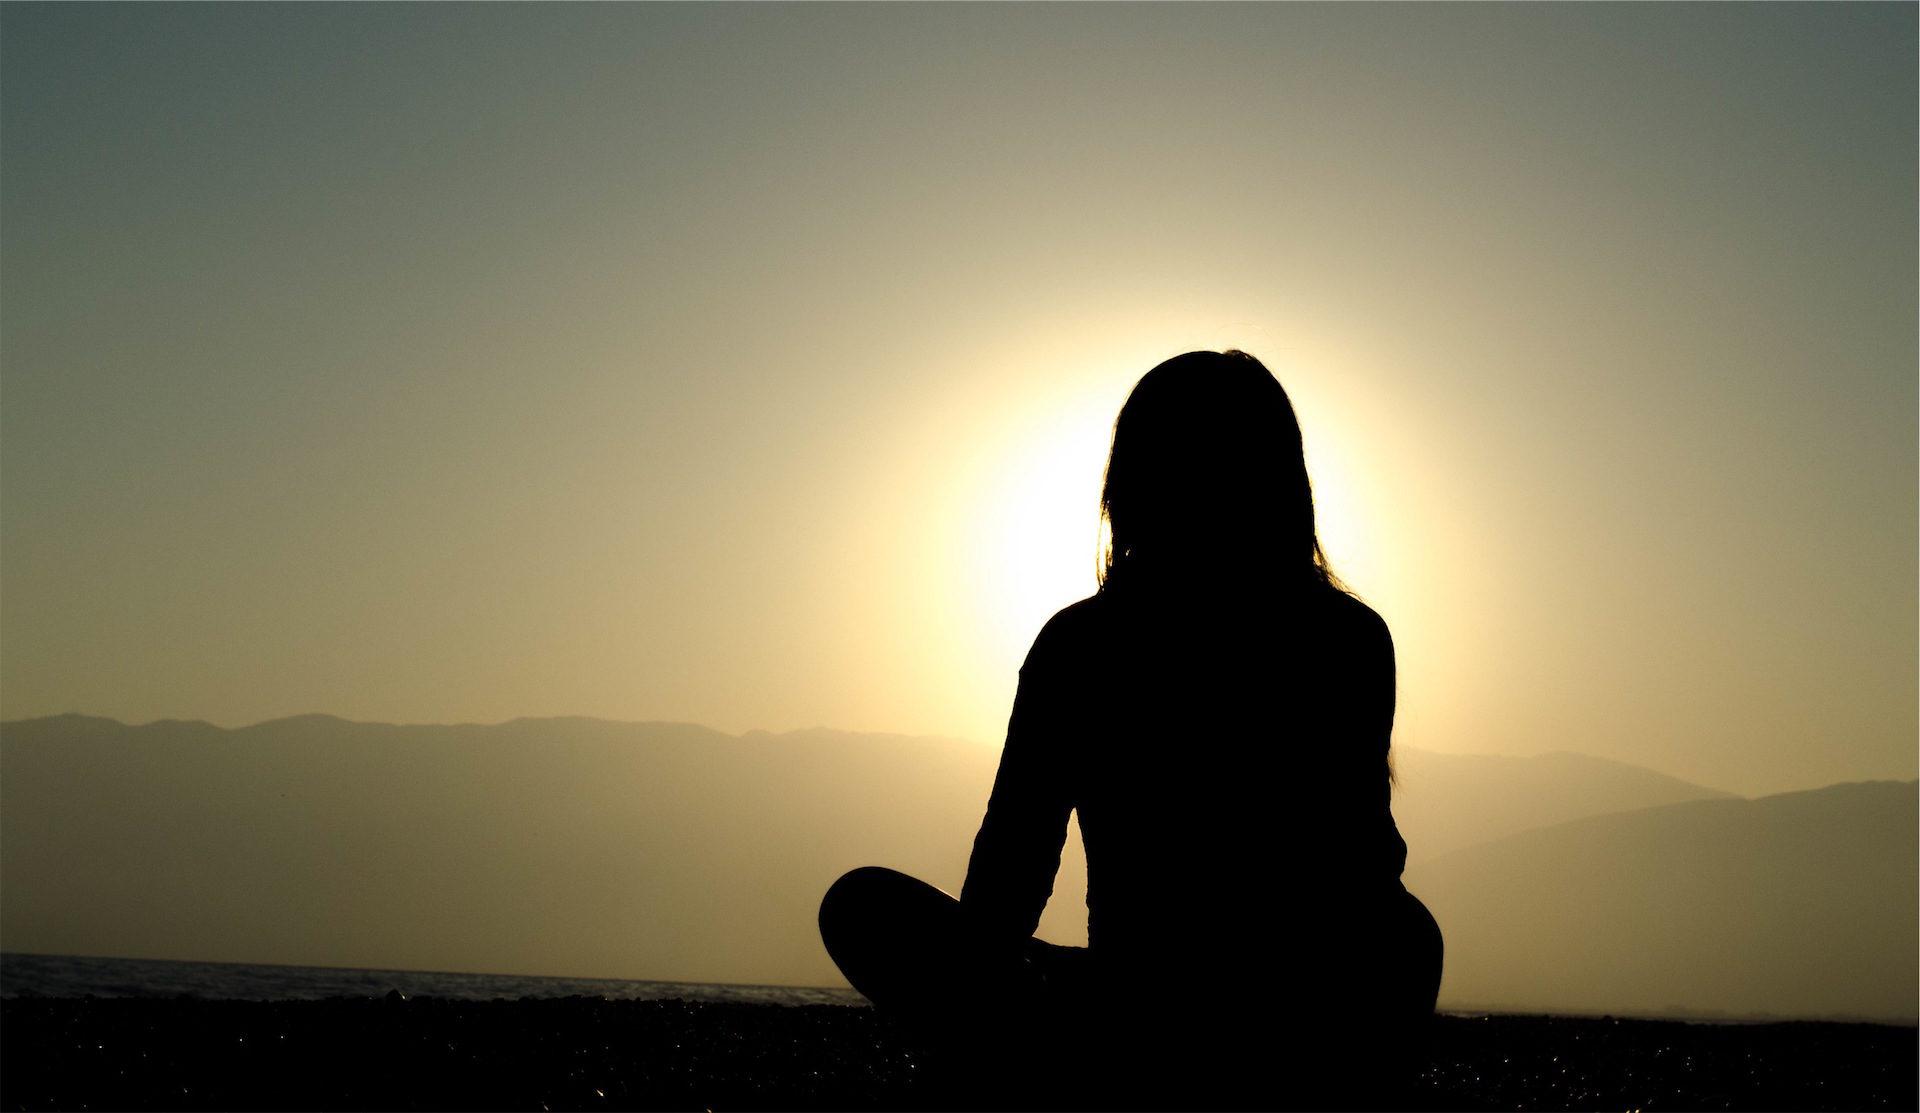 Frau, Meditation, Yoga, Sonne, Nirvana - Wallpaper HD - Prof.-falken.com